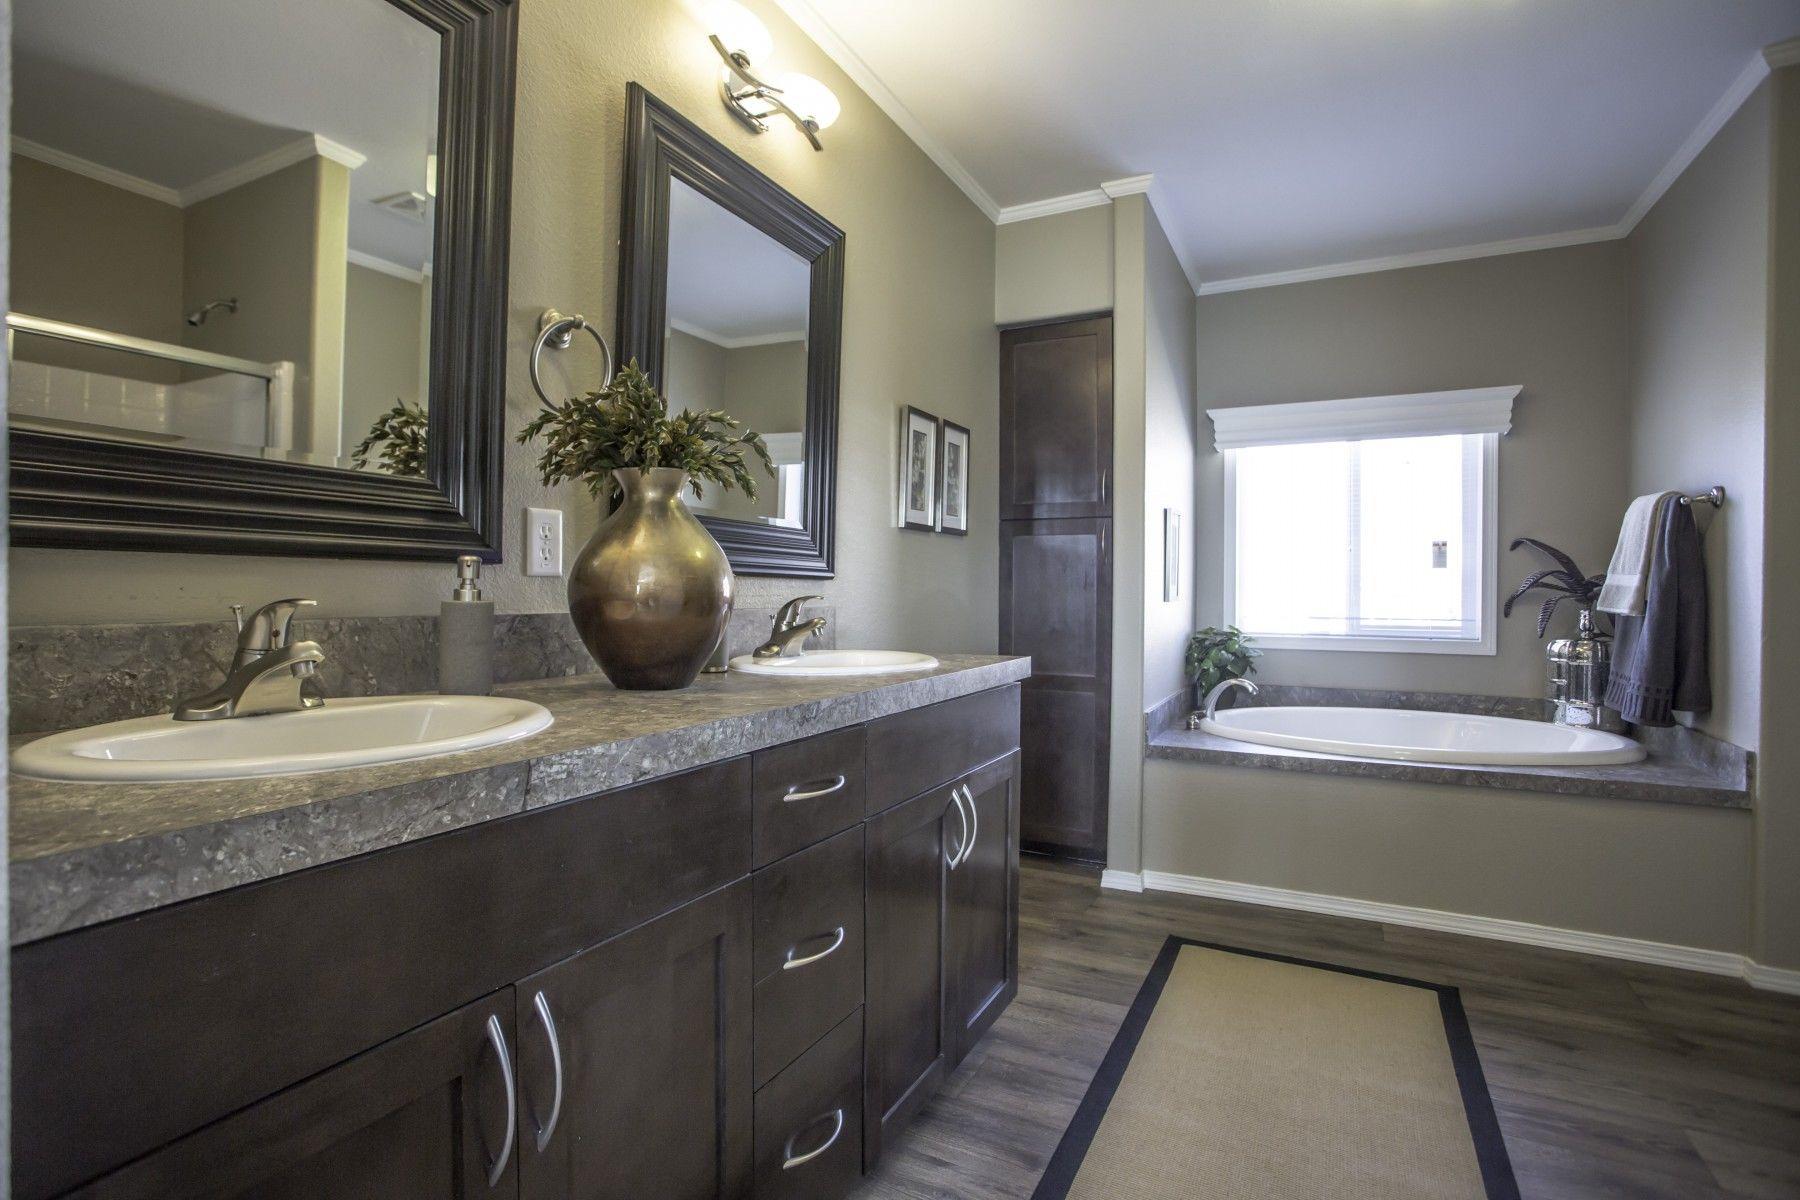 Customization Option for Bathroom of Your Manufactured ... on Model Bathroom Ideas  id=61890